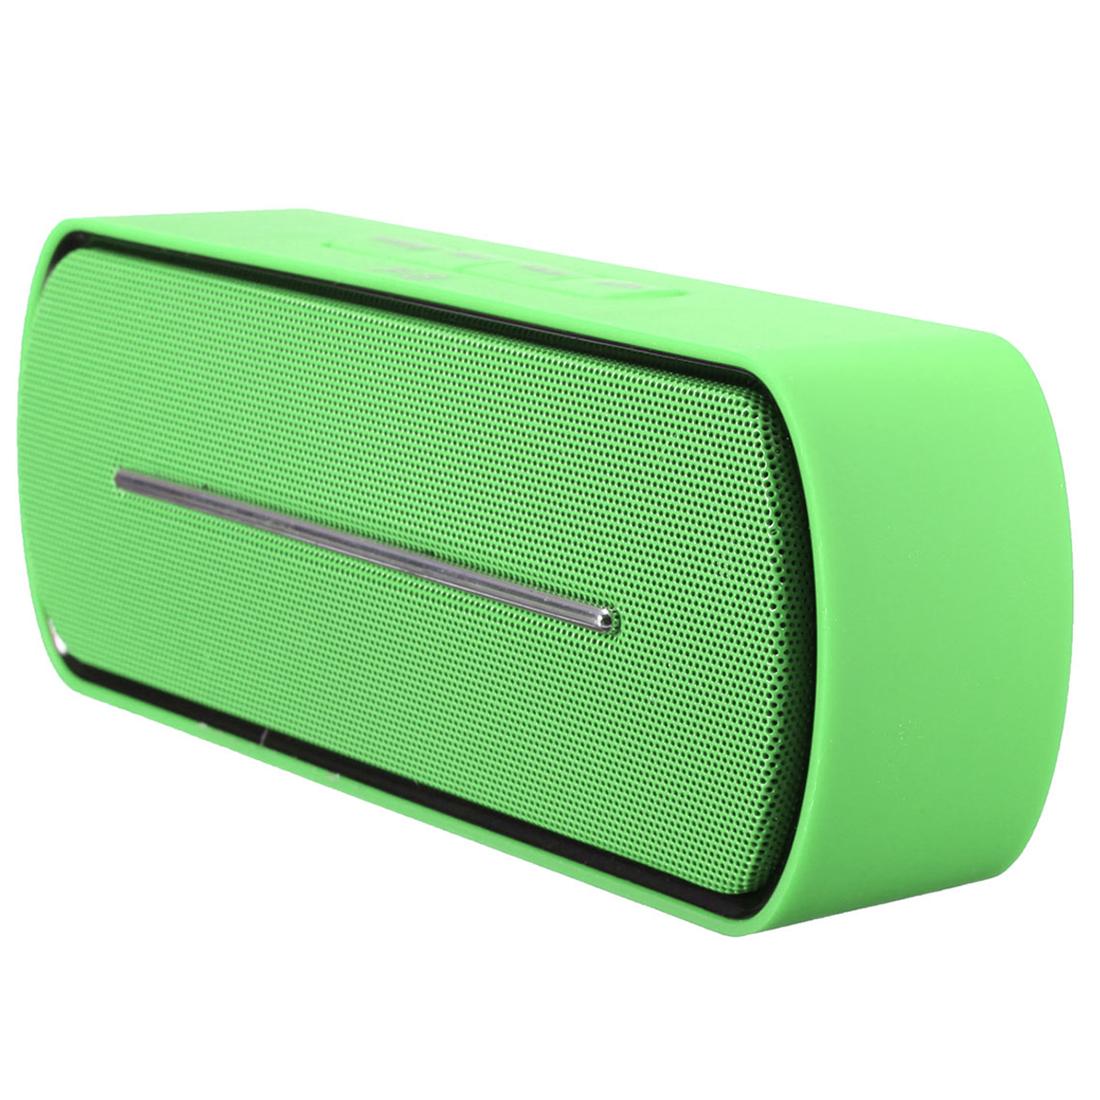 Mini casse wireless bluetooth altoparlante musica stereo w - Stereo casse wireless ...